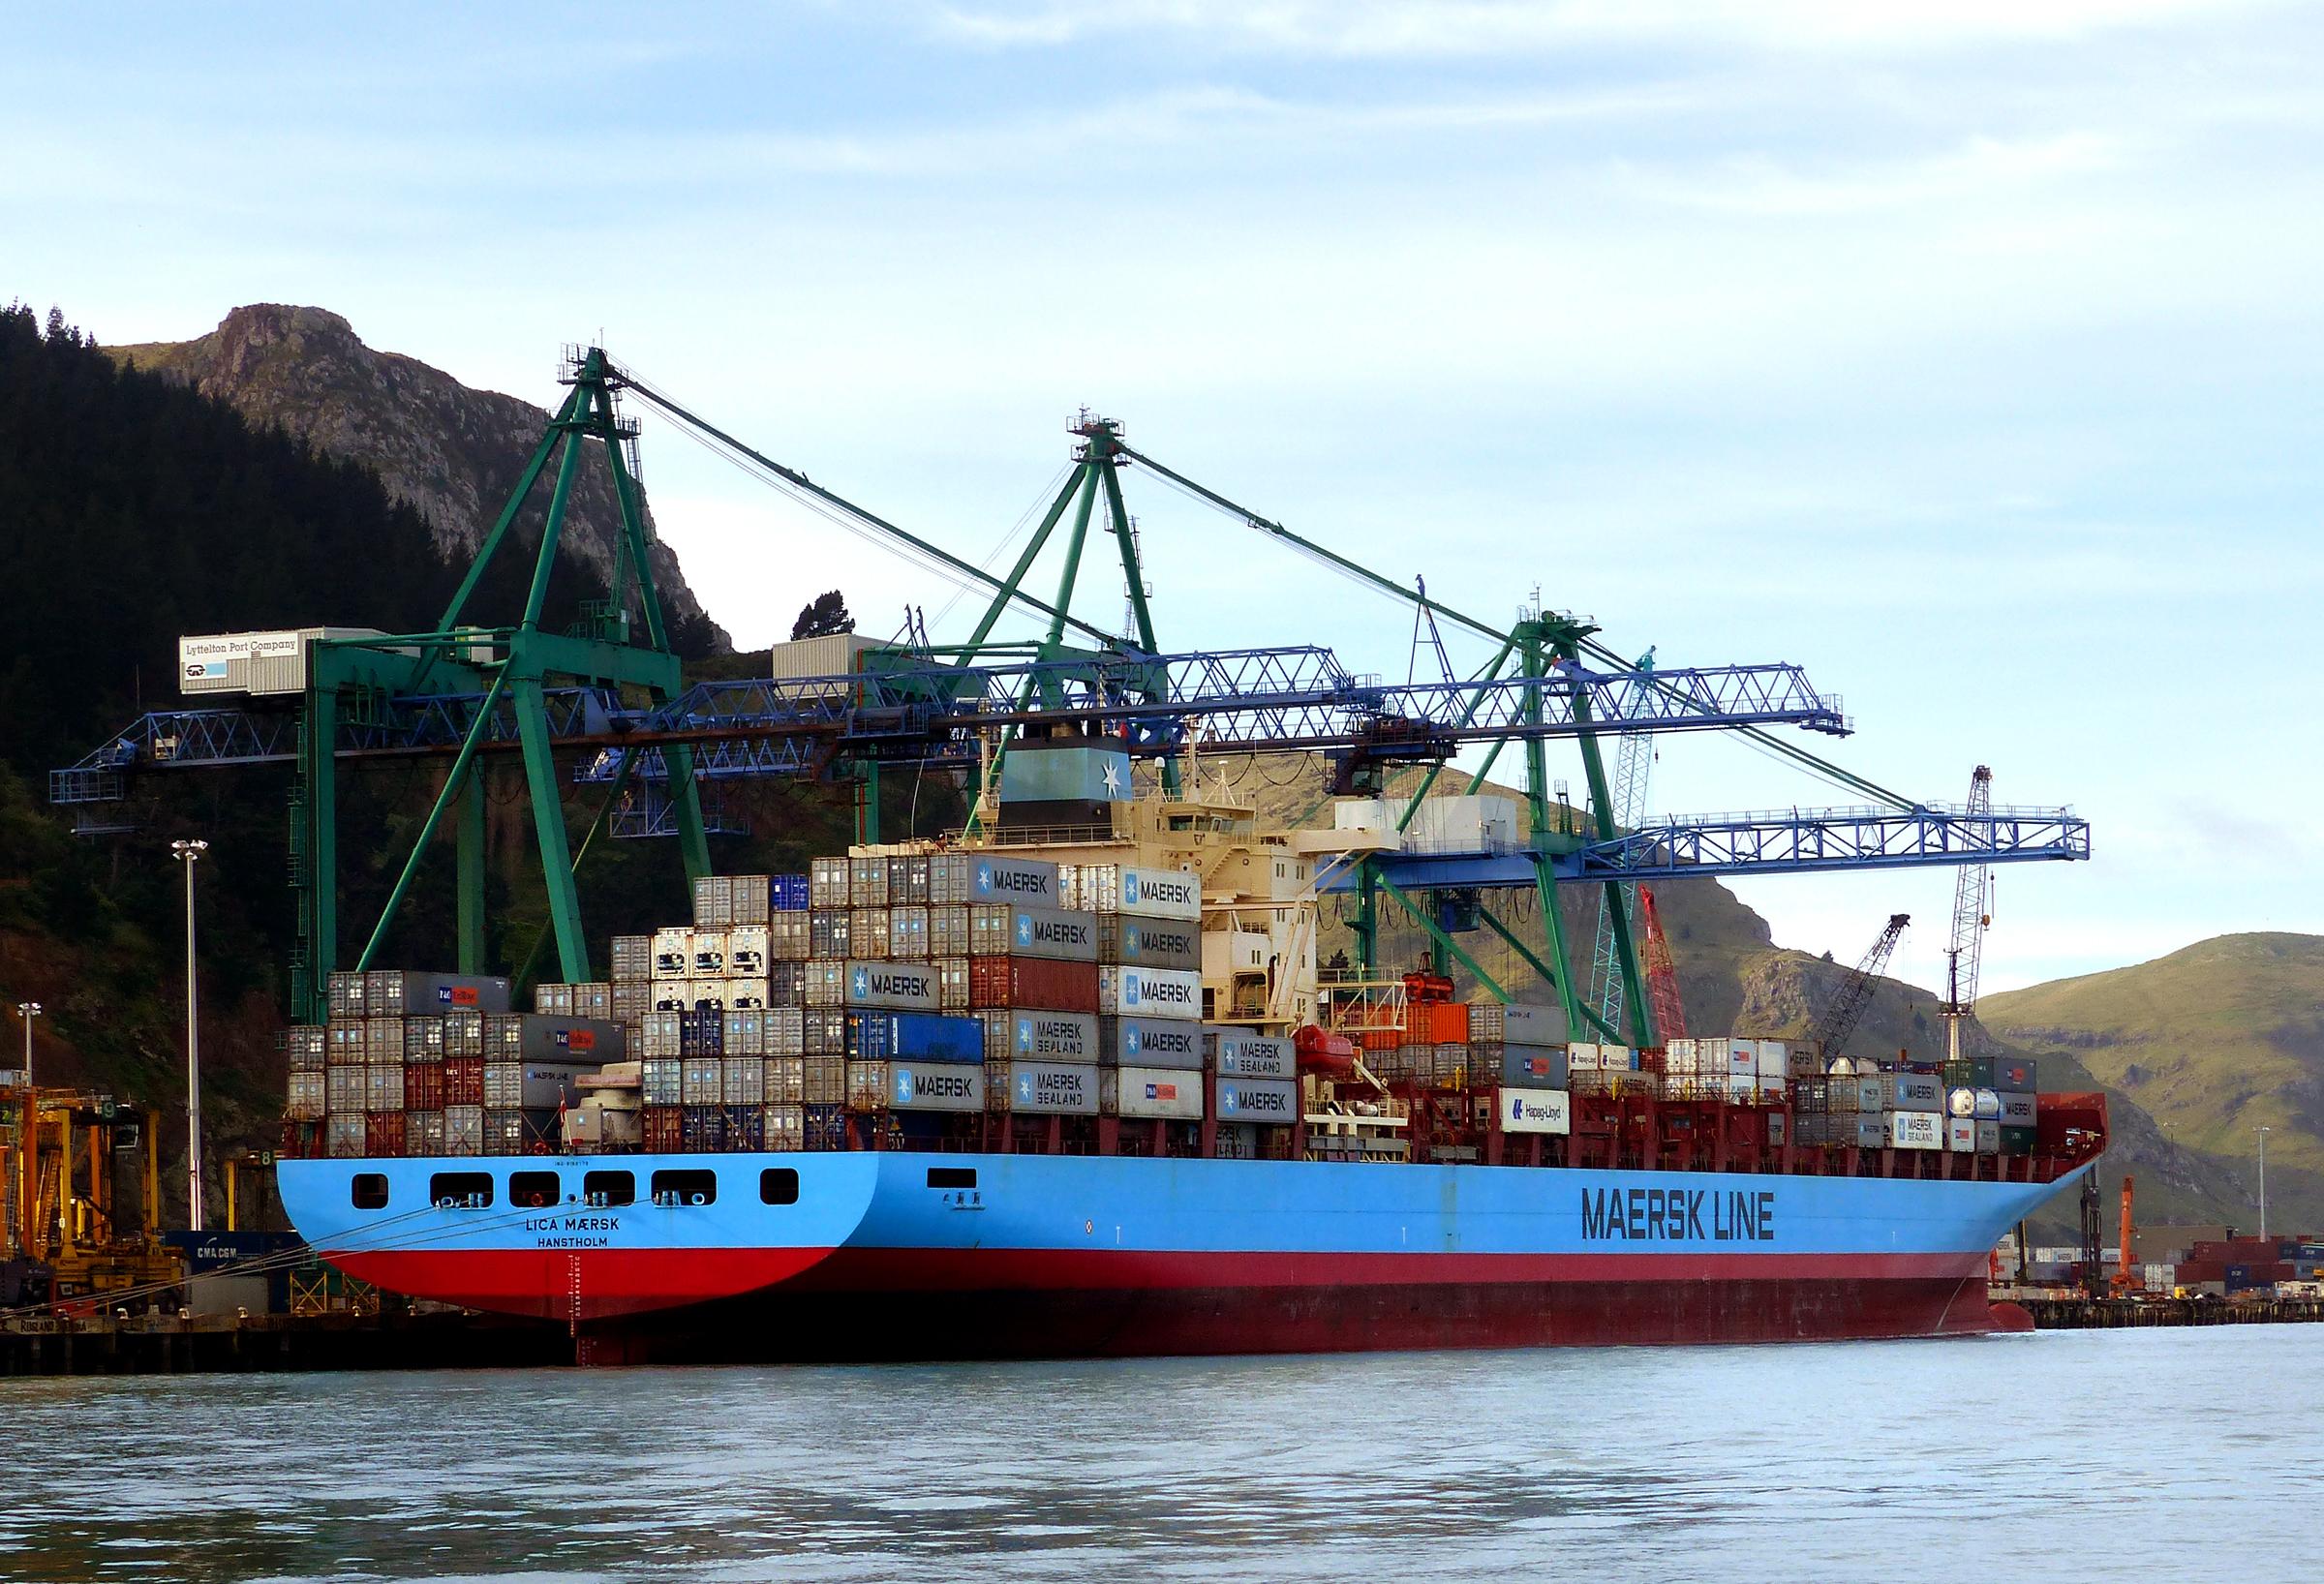 Kostenlose foto : Meer, Boot, Fluss, Schiff, Transport, Fahrzeug ...